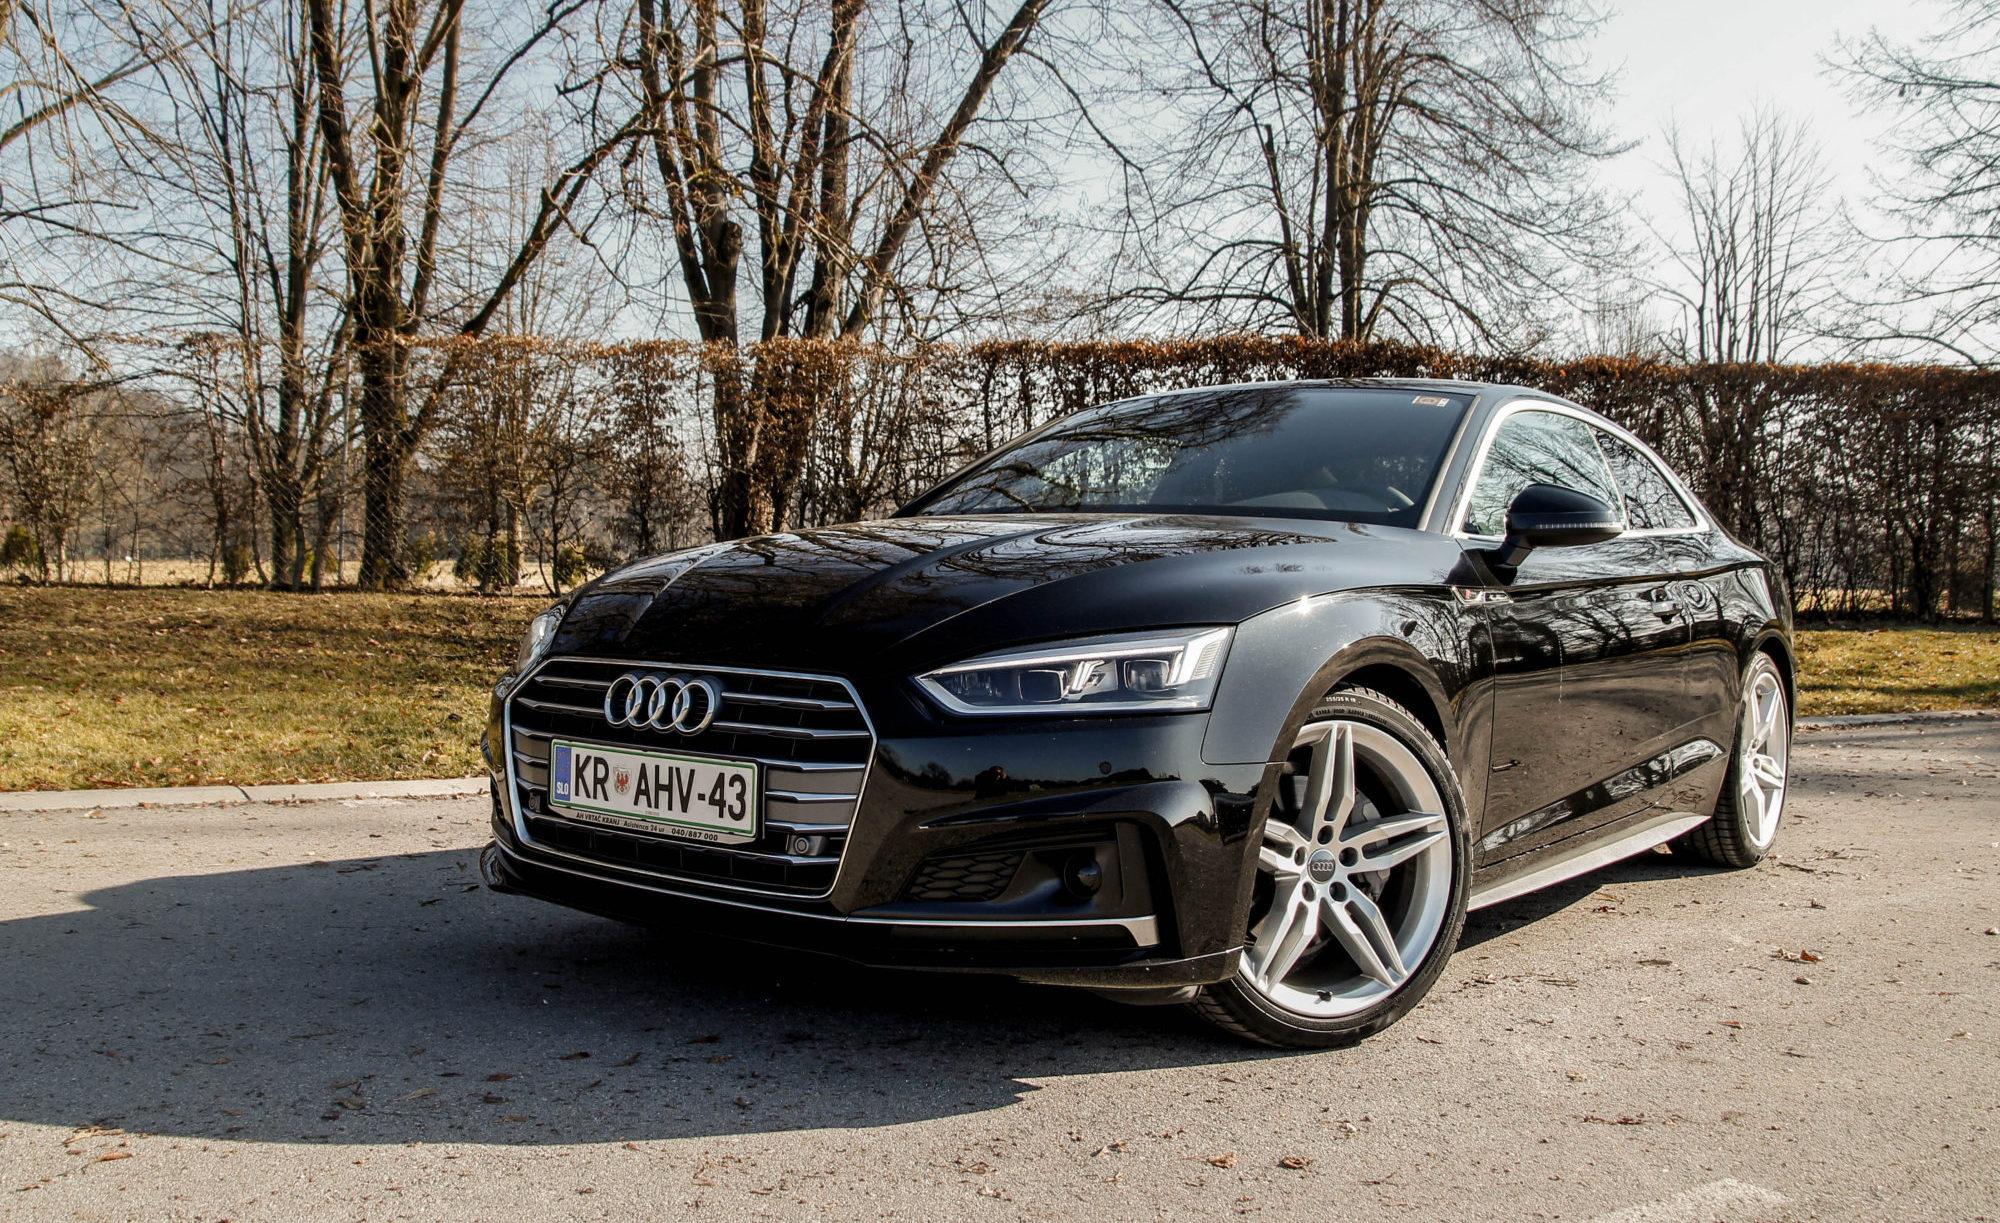 Novo doma: Audi A5 Coupe (športna eleganca)